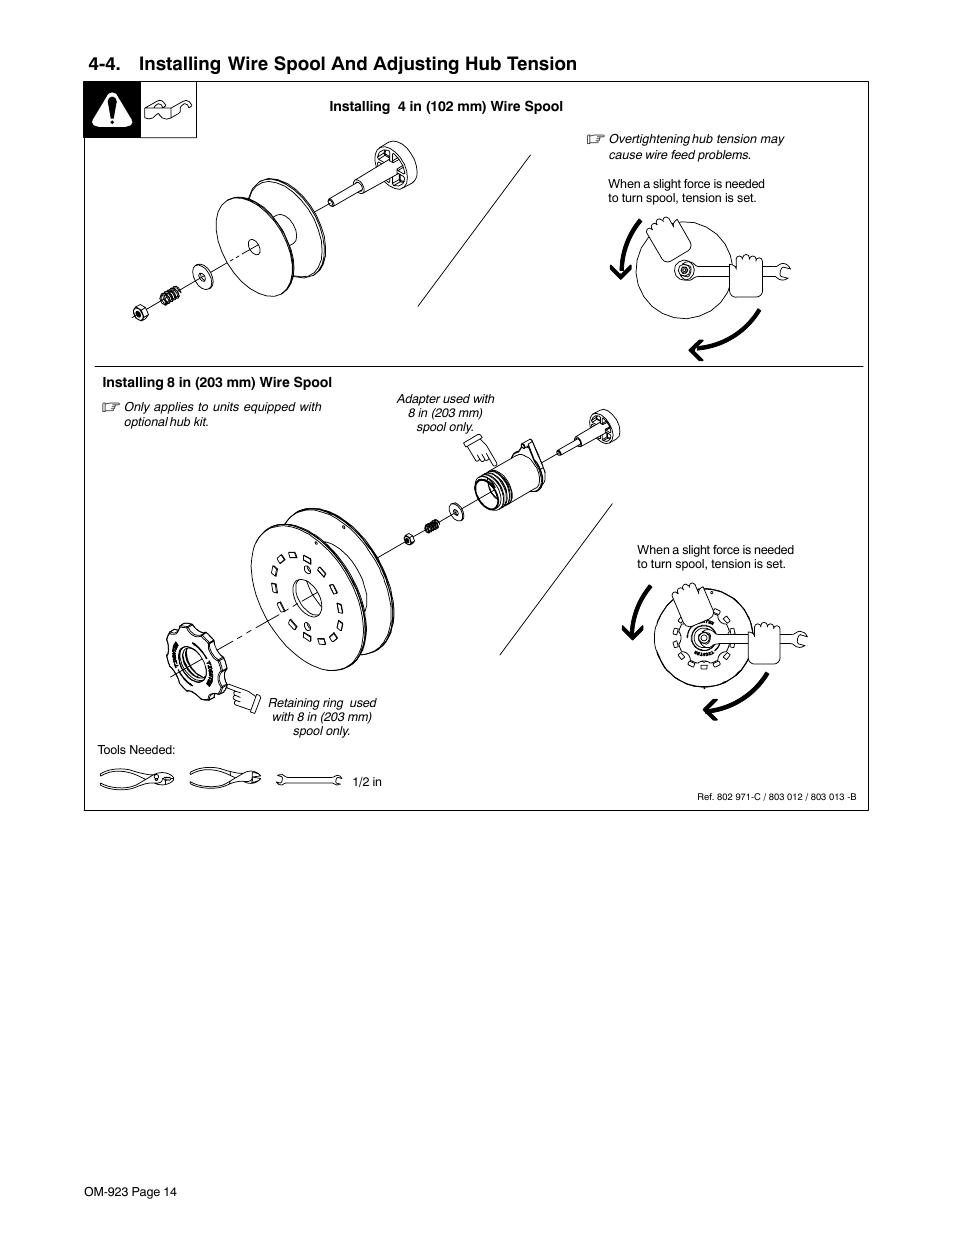 Hobart Rc 301 Wiring Diagram Hobart Wiring-Diagram CAW - Wiring Diagrams